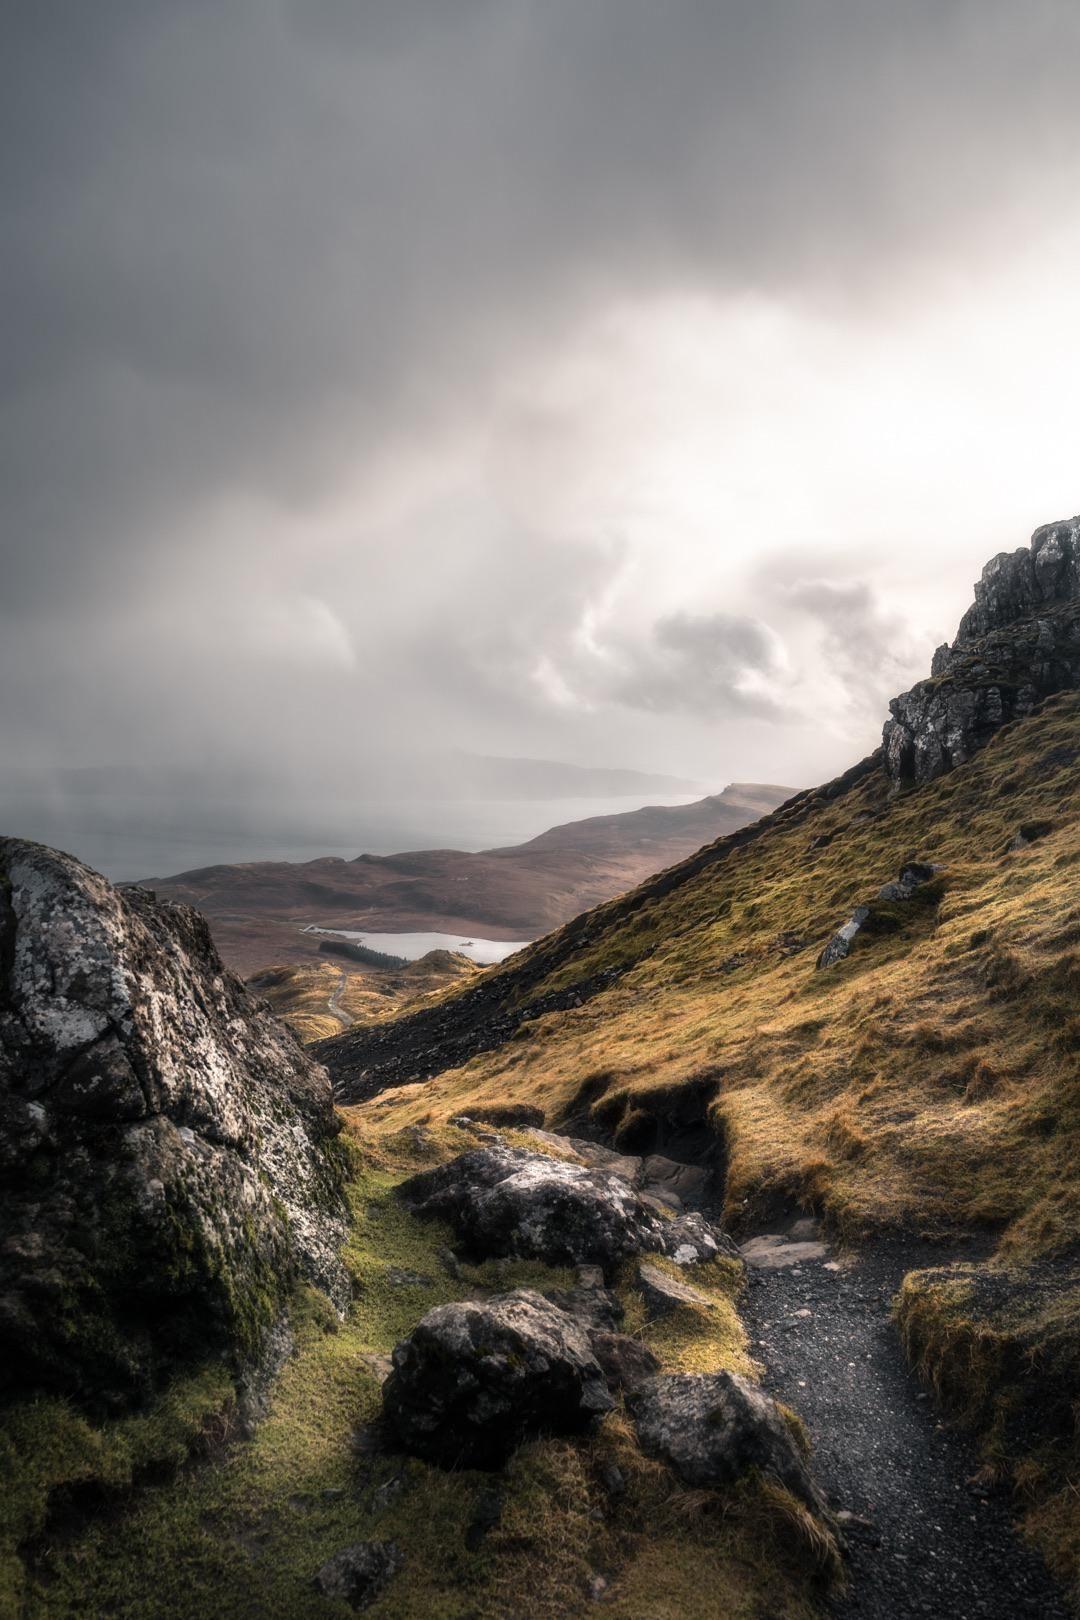 Descending The Old Man Of Storr In Skye Scotland Oc 1080x1620 Ig Rbrgsshttps I Redd It Qcg In 2020 Skye Scotland Landscape Photography Beautiful Places To Visit